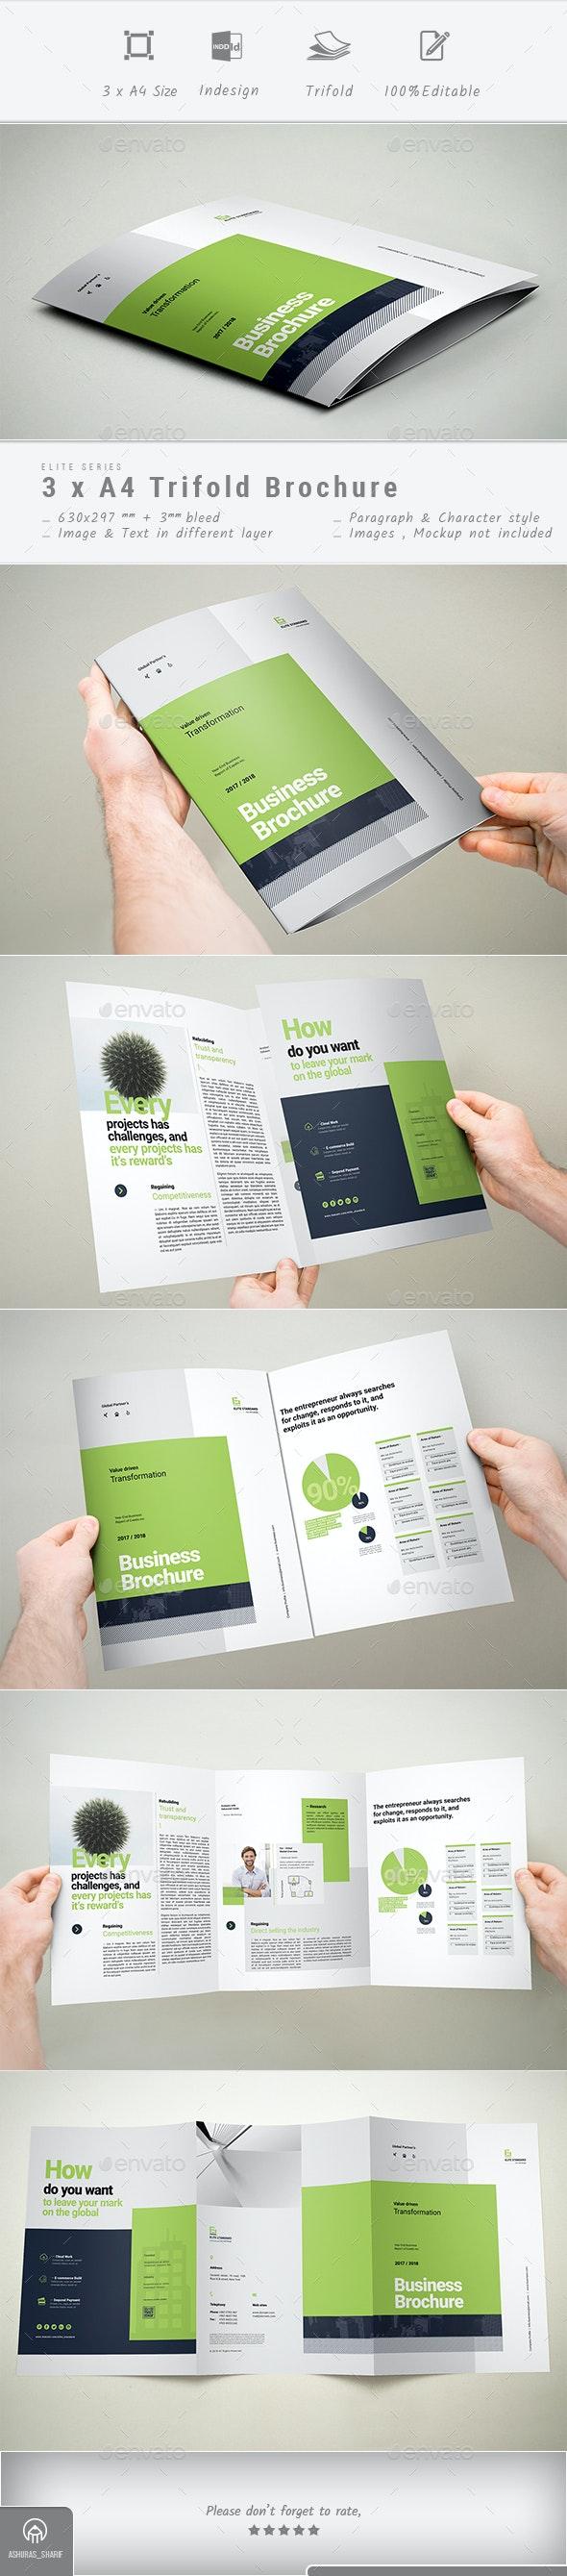 3xA4 Trifold Brochure - Corporate Brochures